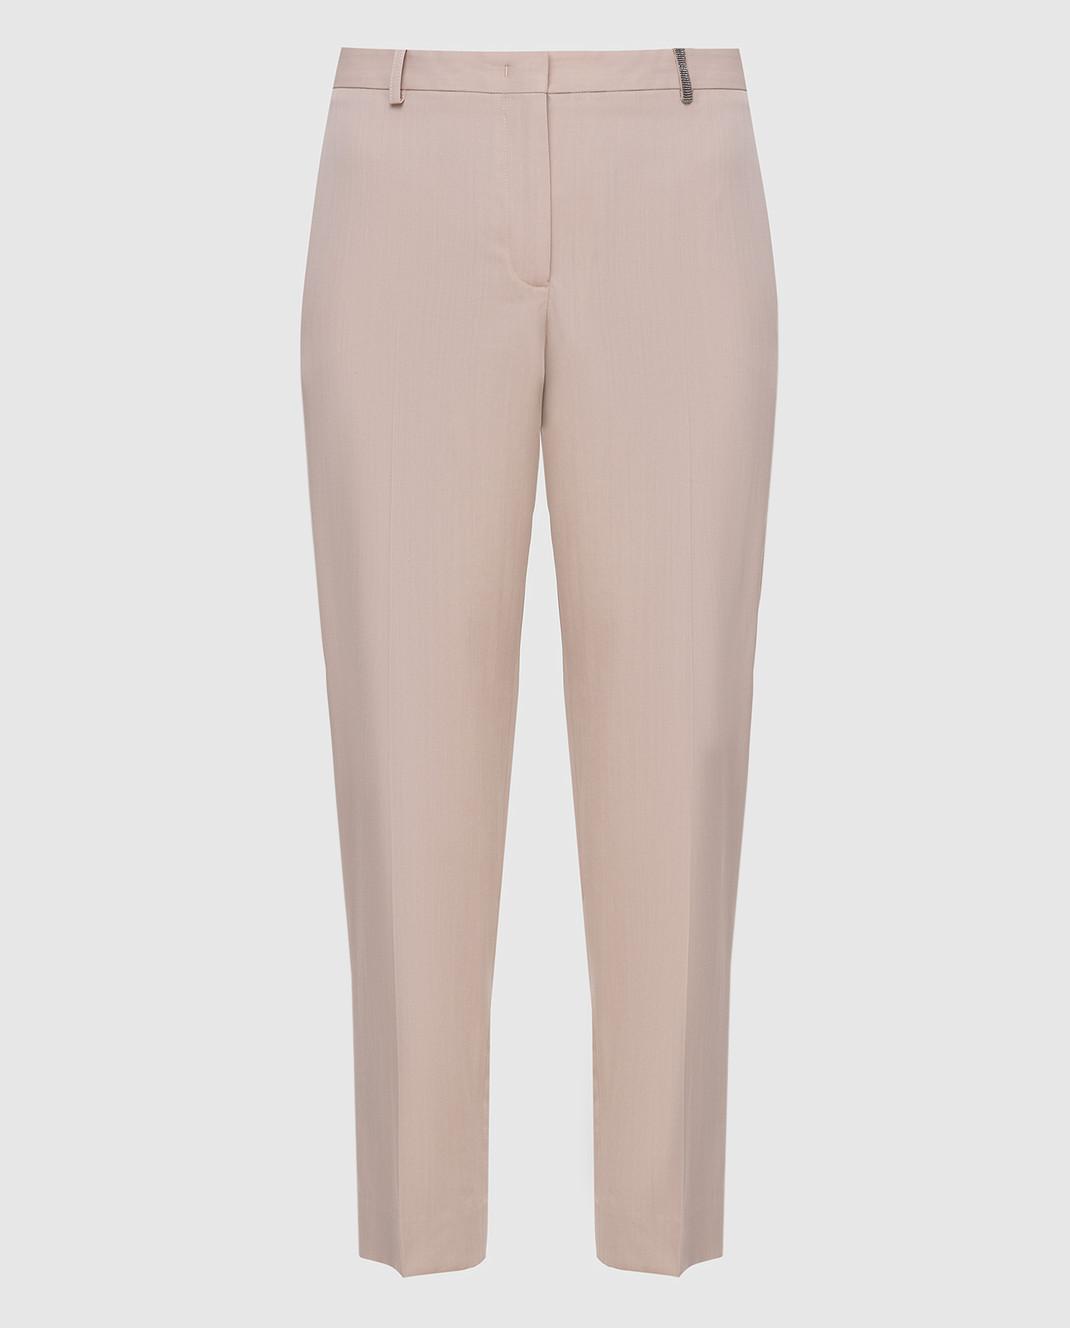 Fabiana Filippi Бежевые брюки из шерсти изображение 1